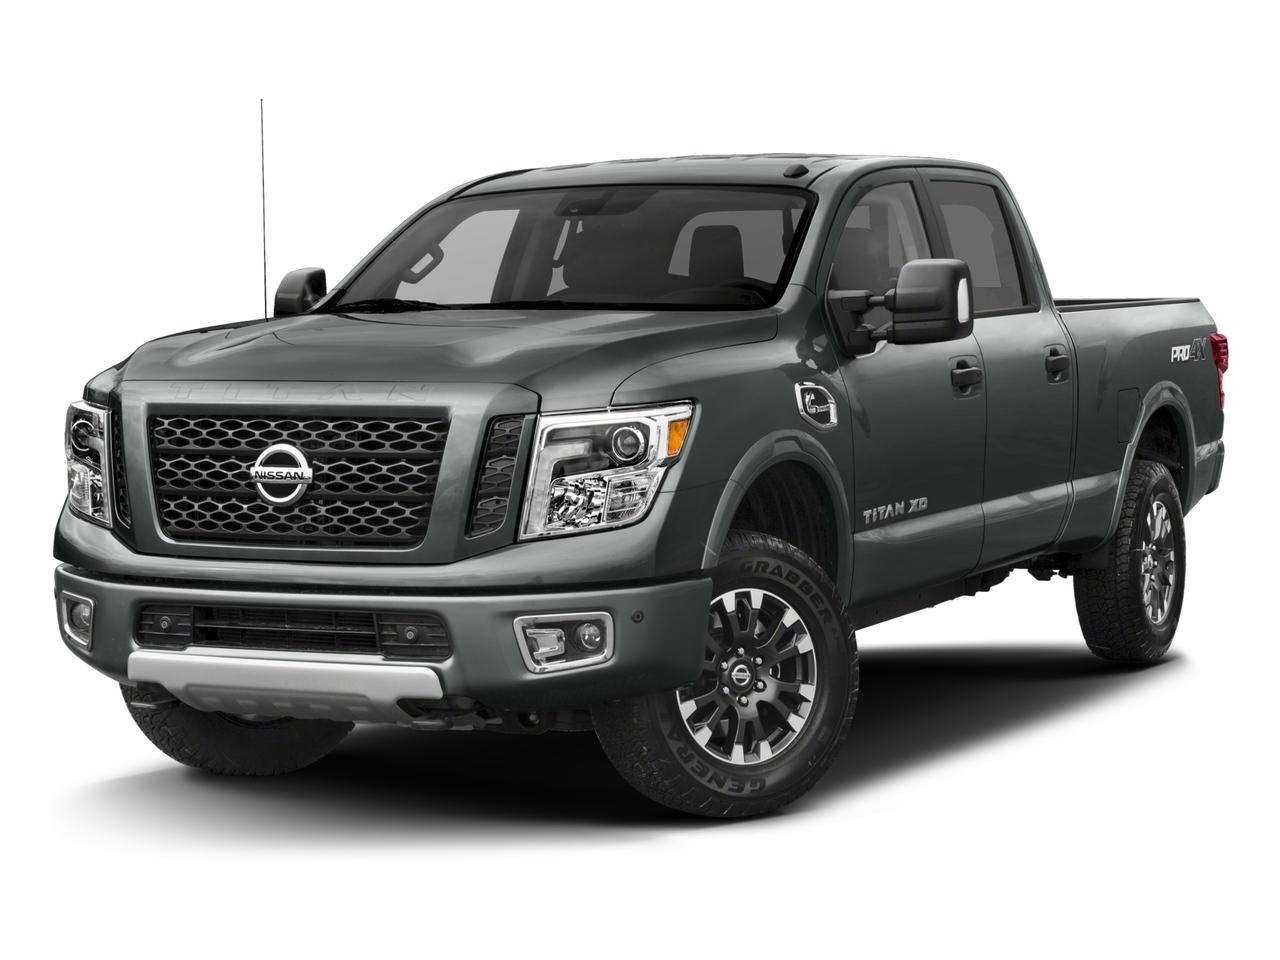 2017 Nissan Titan XD Vehicle Photo in TEMPLE, TX 76504-3447